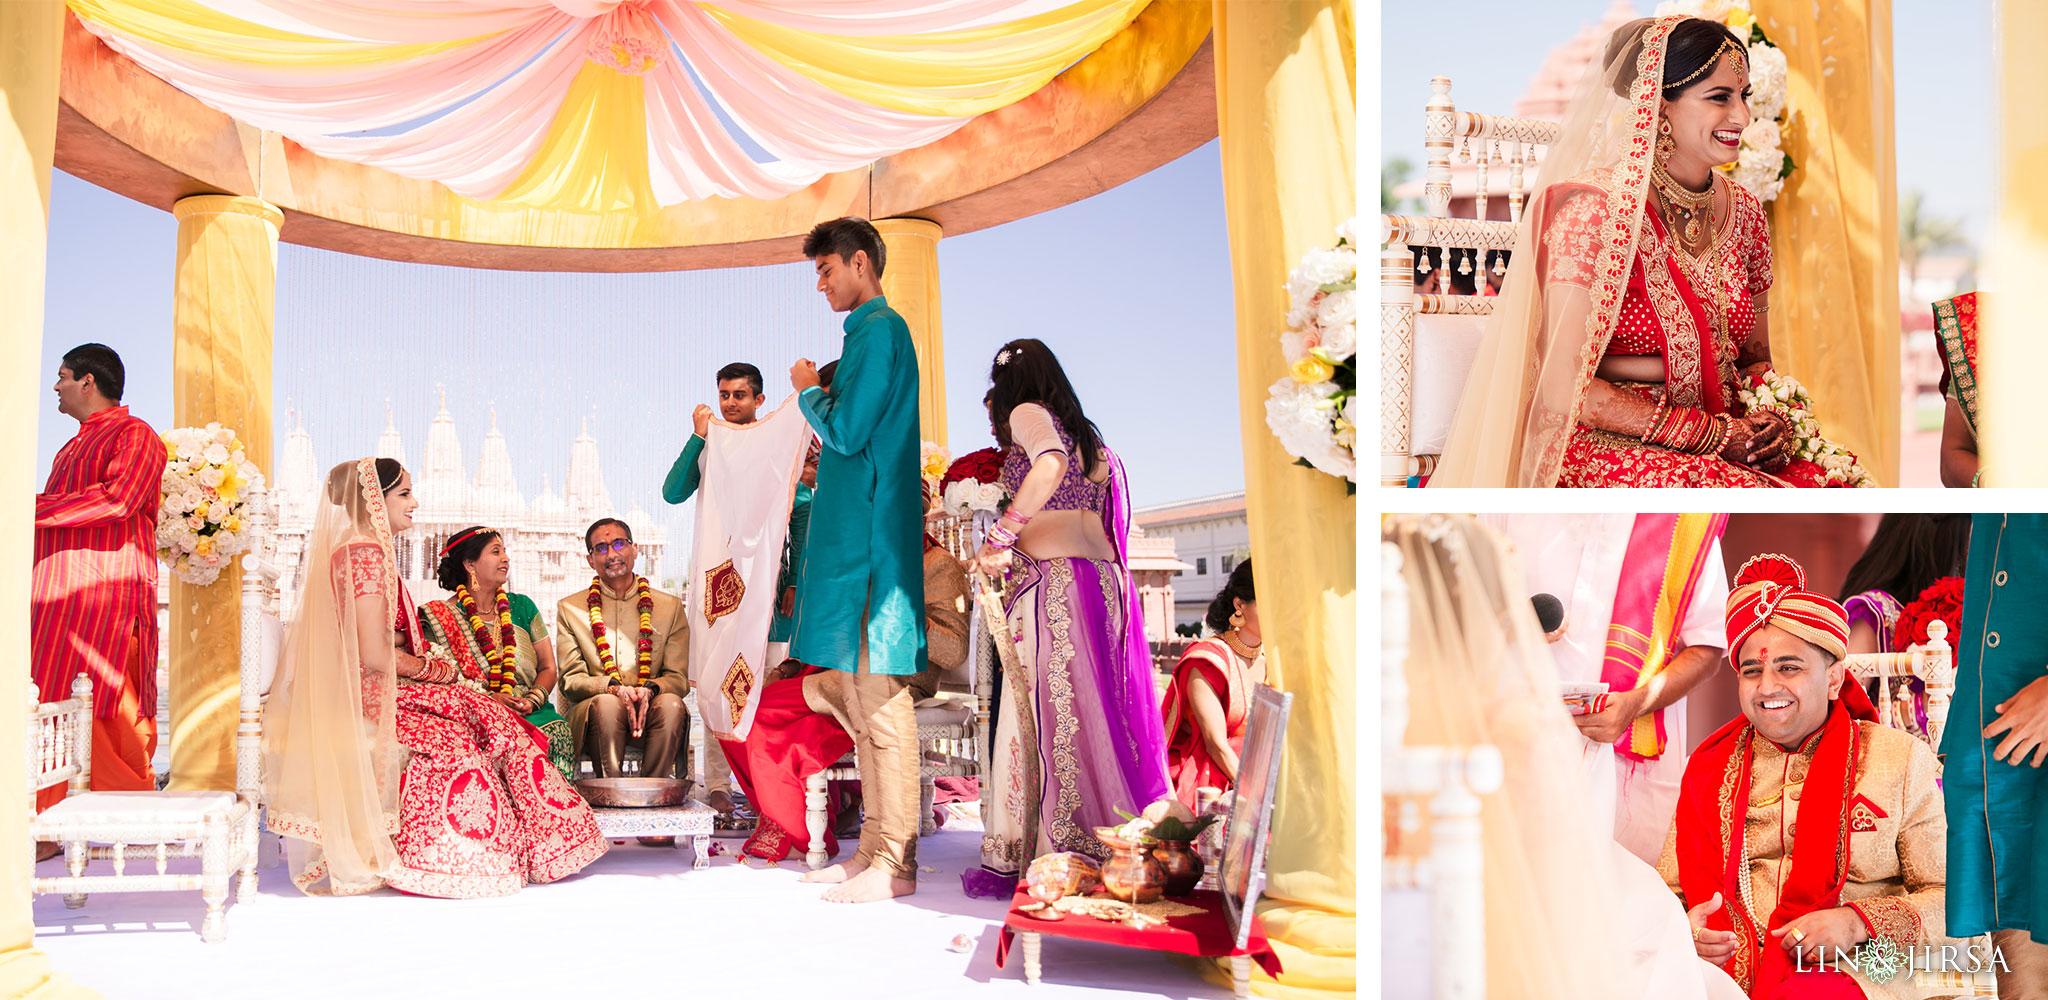 087 BAPS Swaminarayan Sanstha Chino Hills Indian Wedding Photography